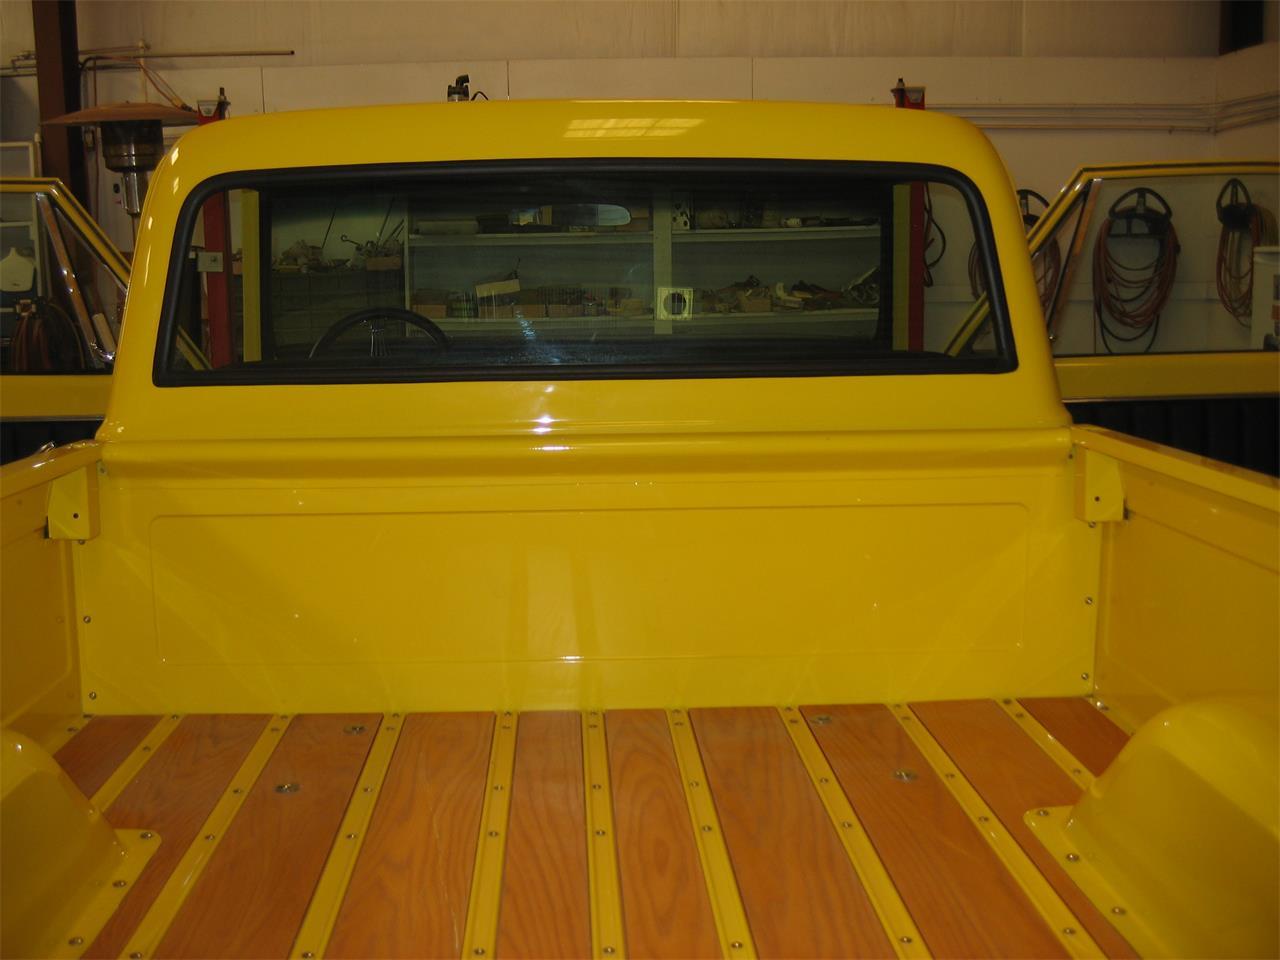 1968 Chevrolet Pickup (CC-1367842) for sale in Strathmore, California